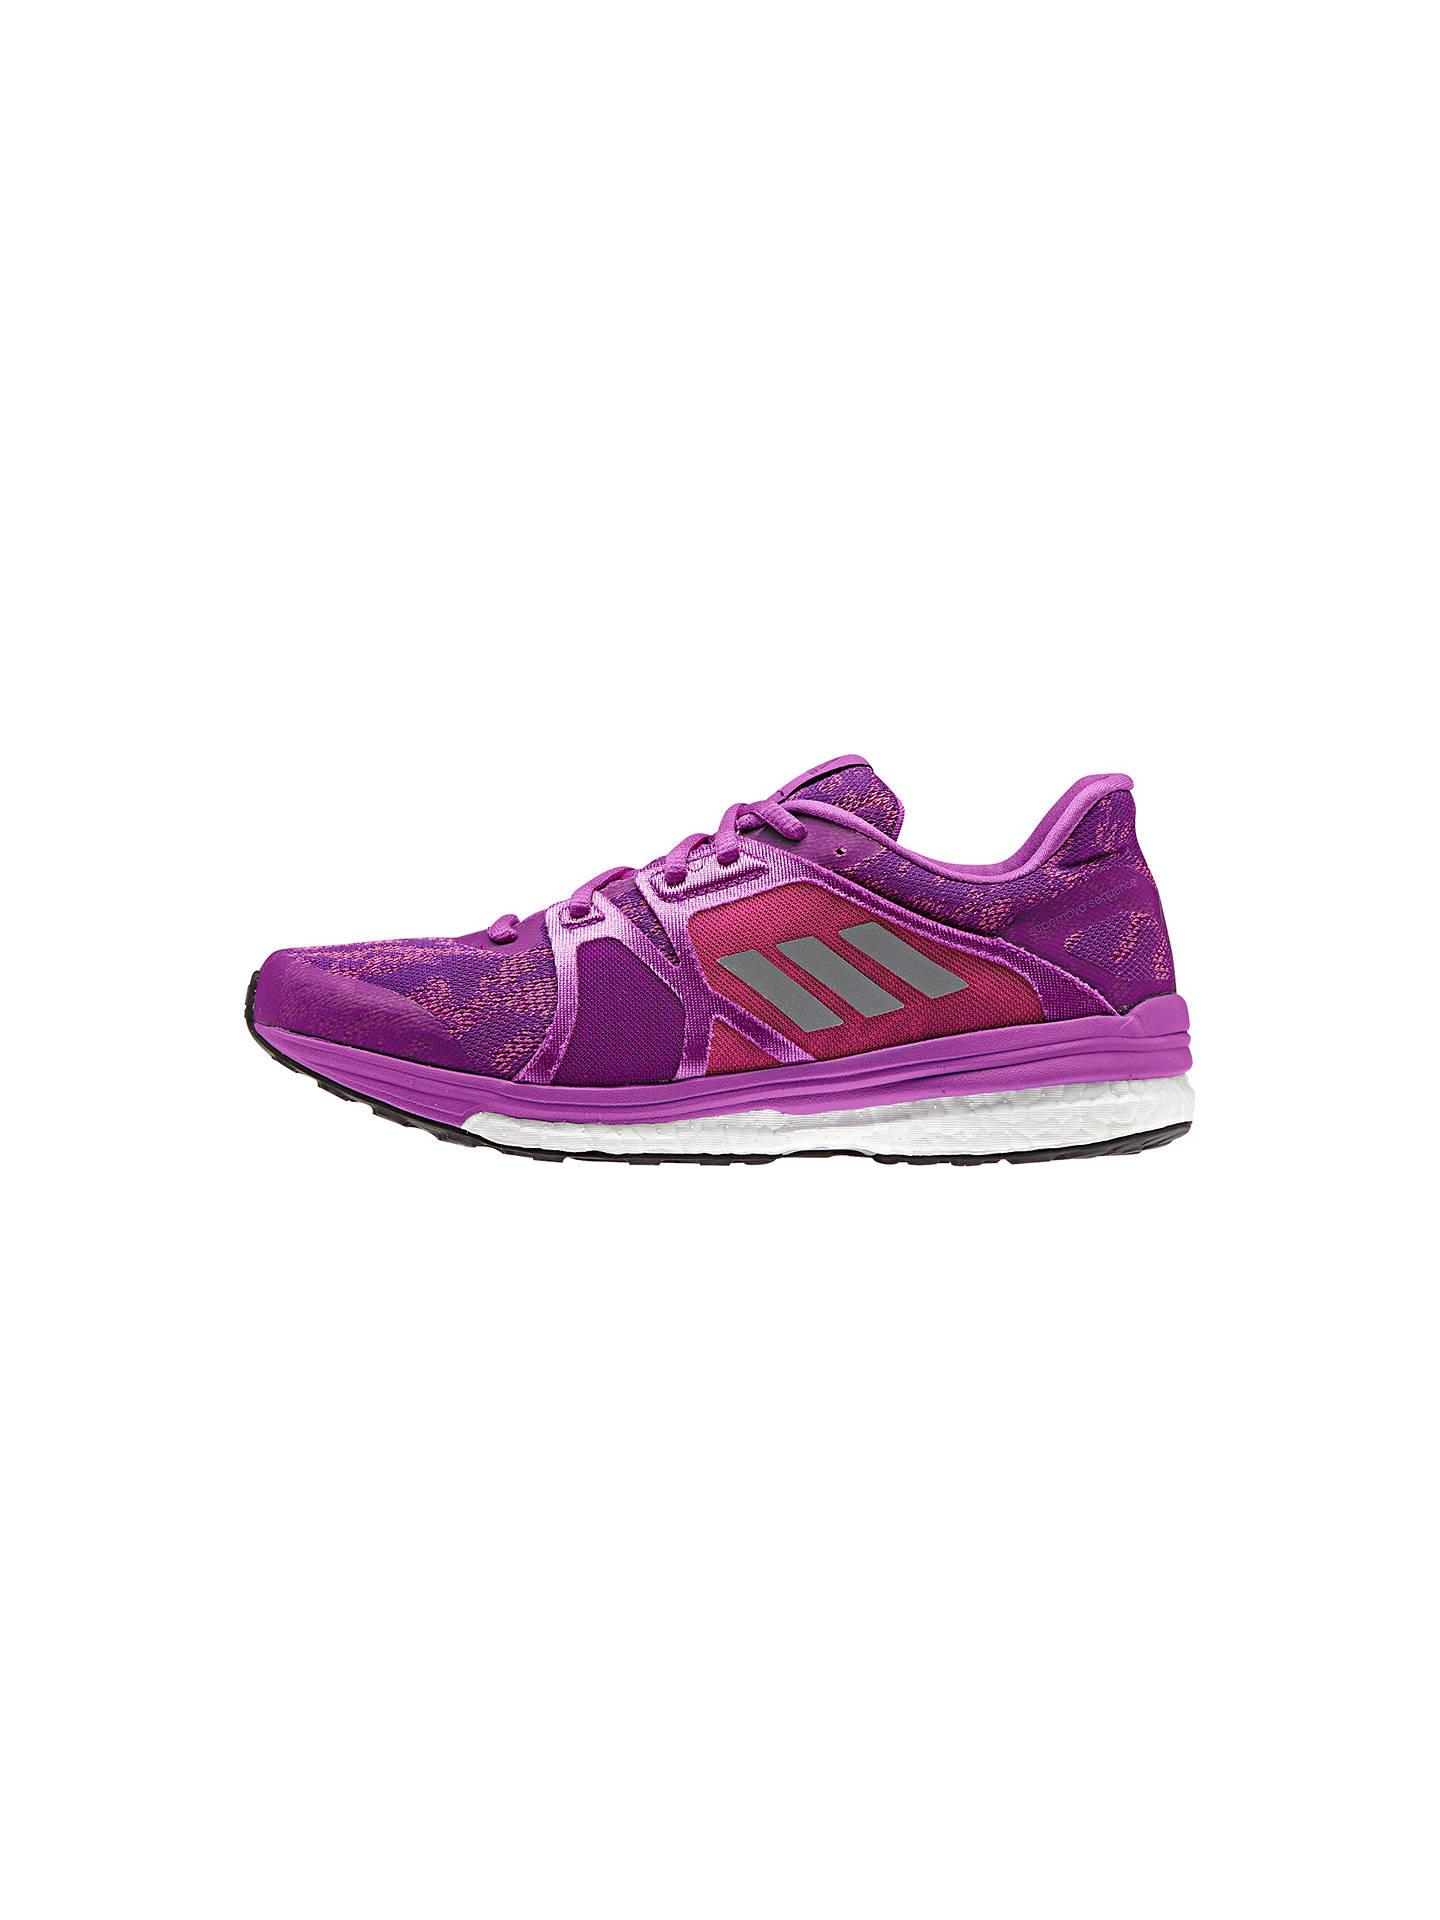 0179fa52d0a BuyAdidas Supernova Sequence 9 Women s Running Shoes